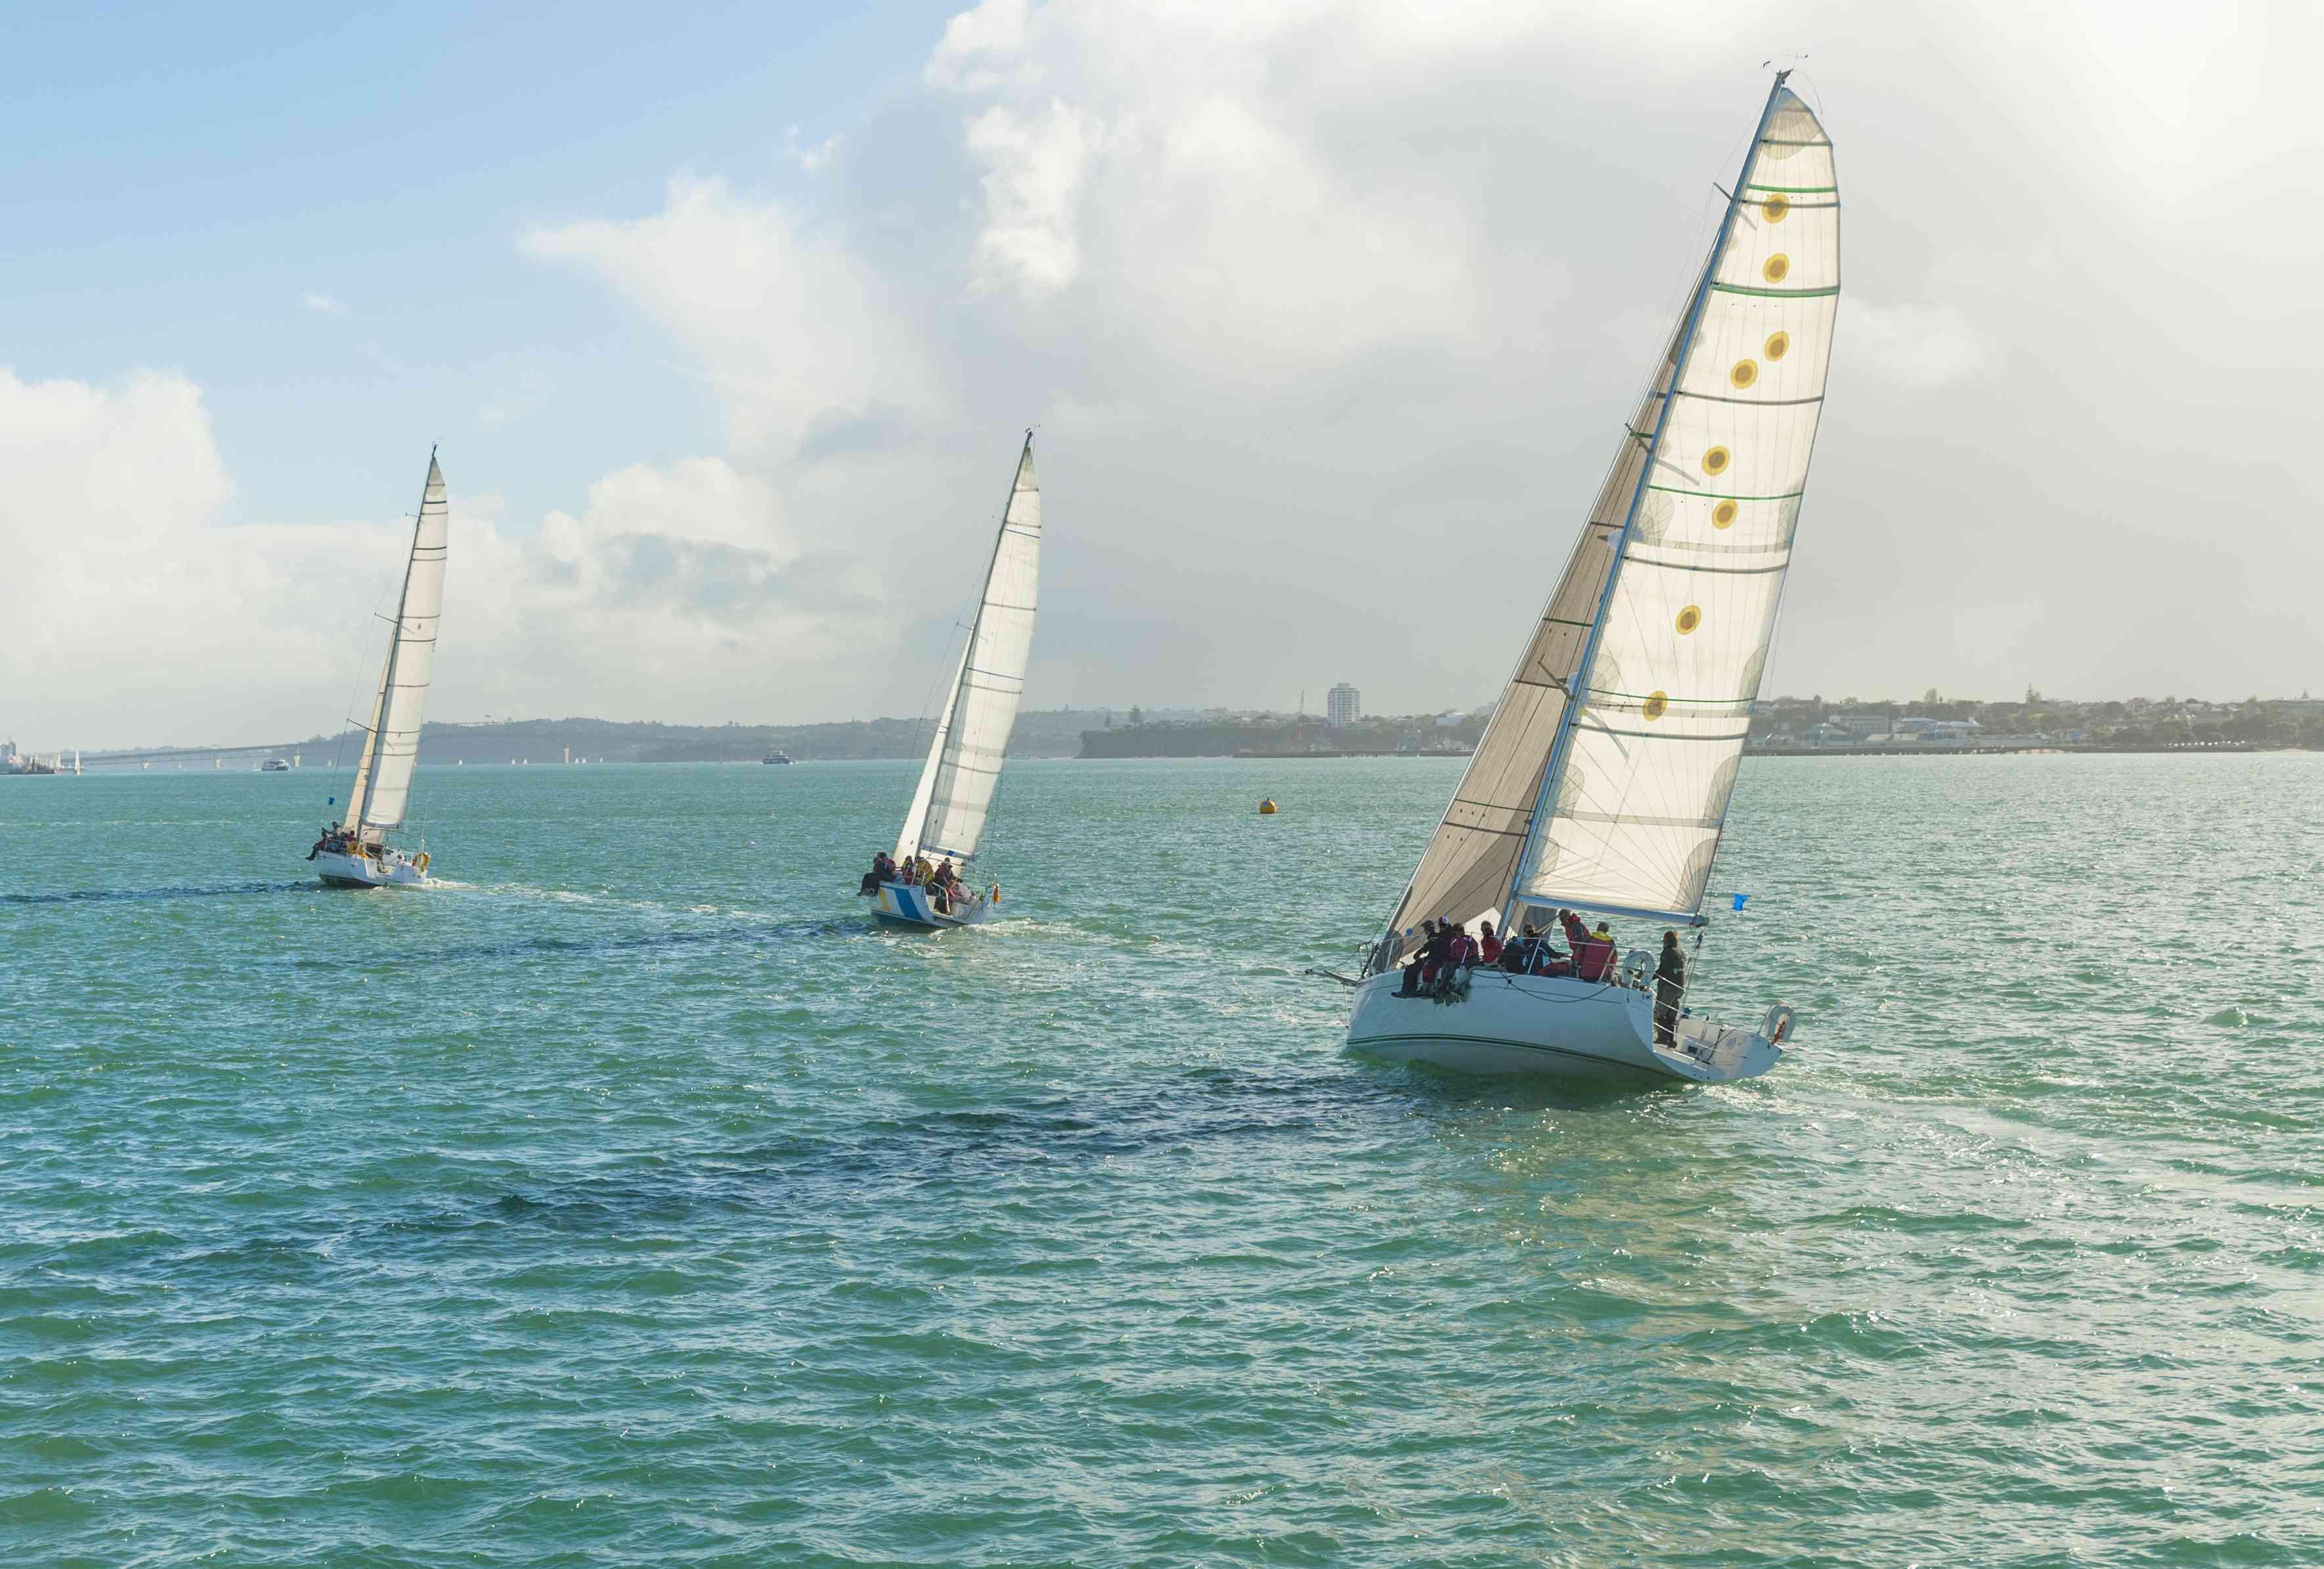 three yachts racing